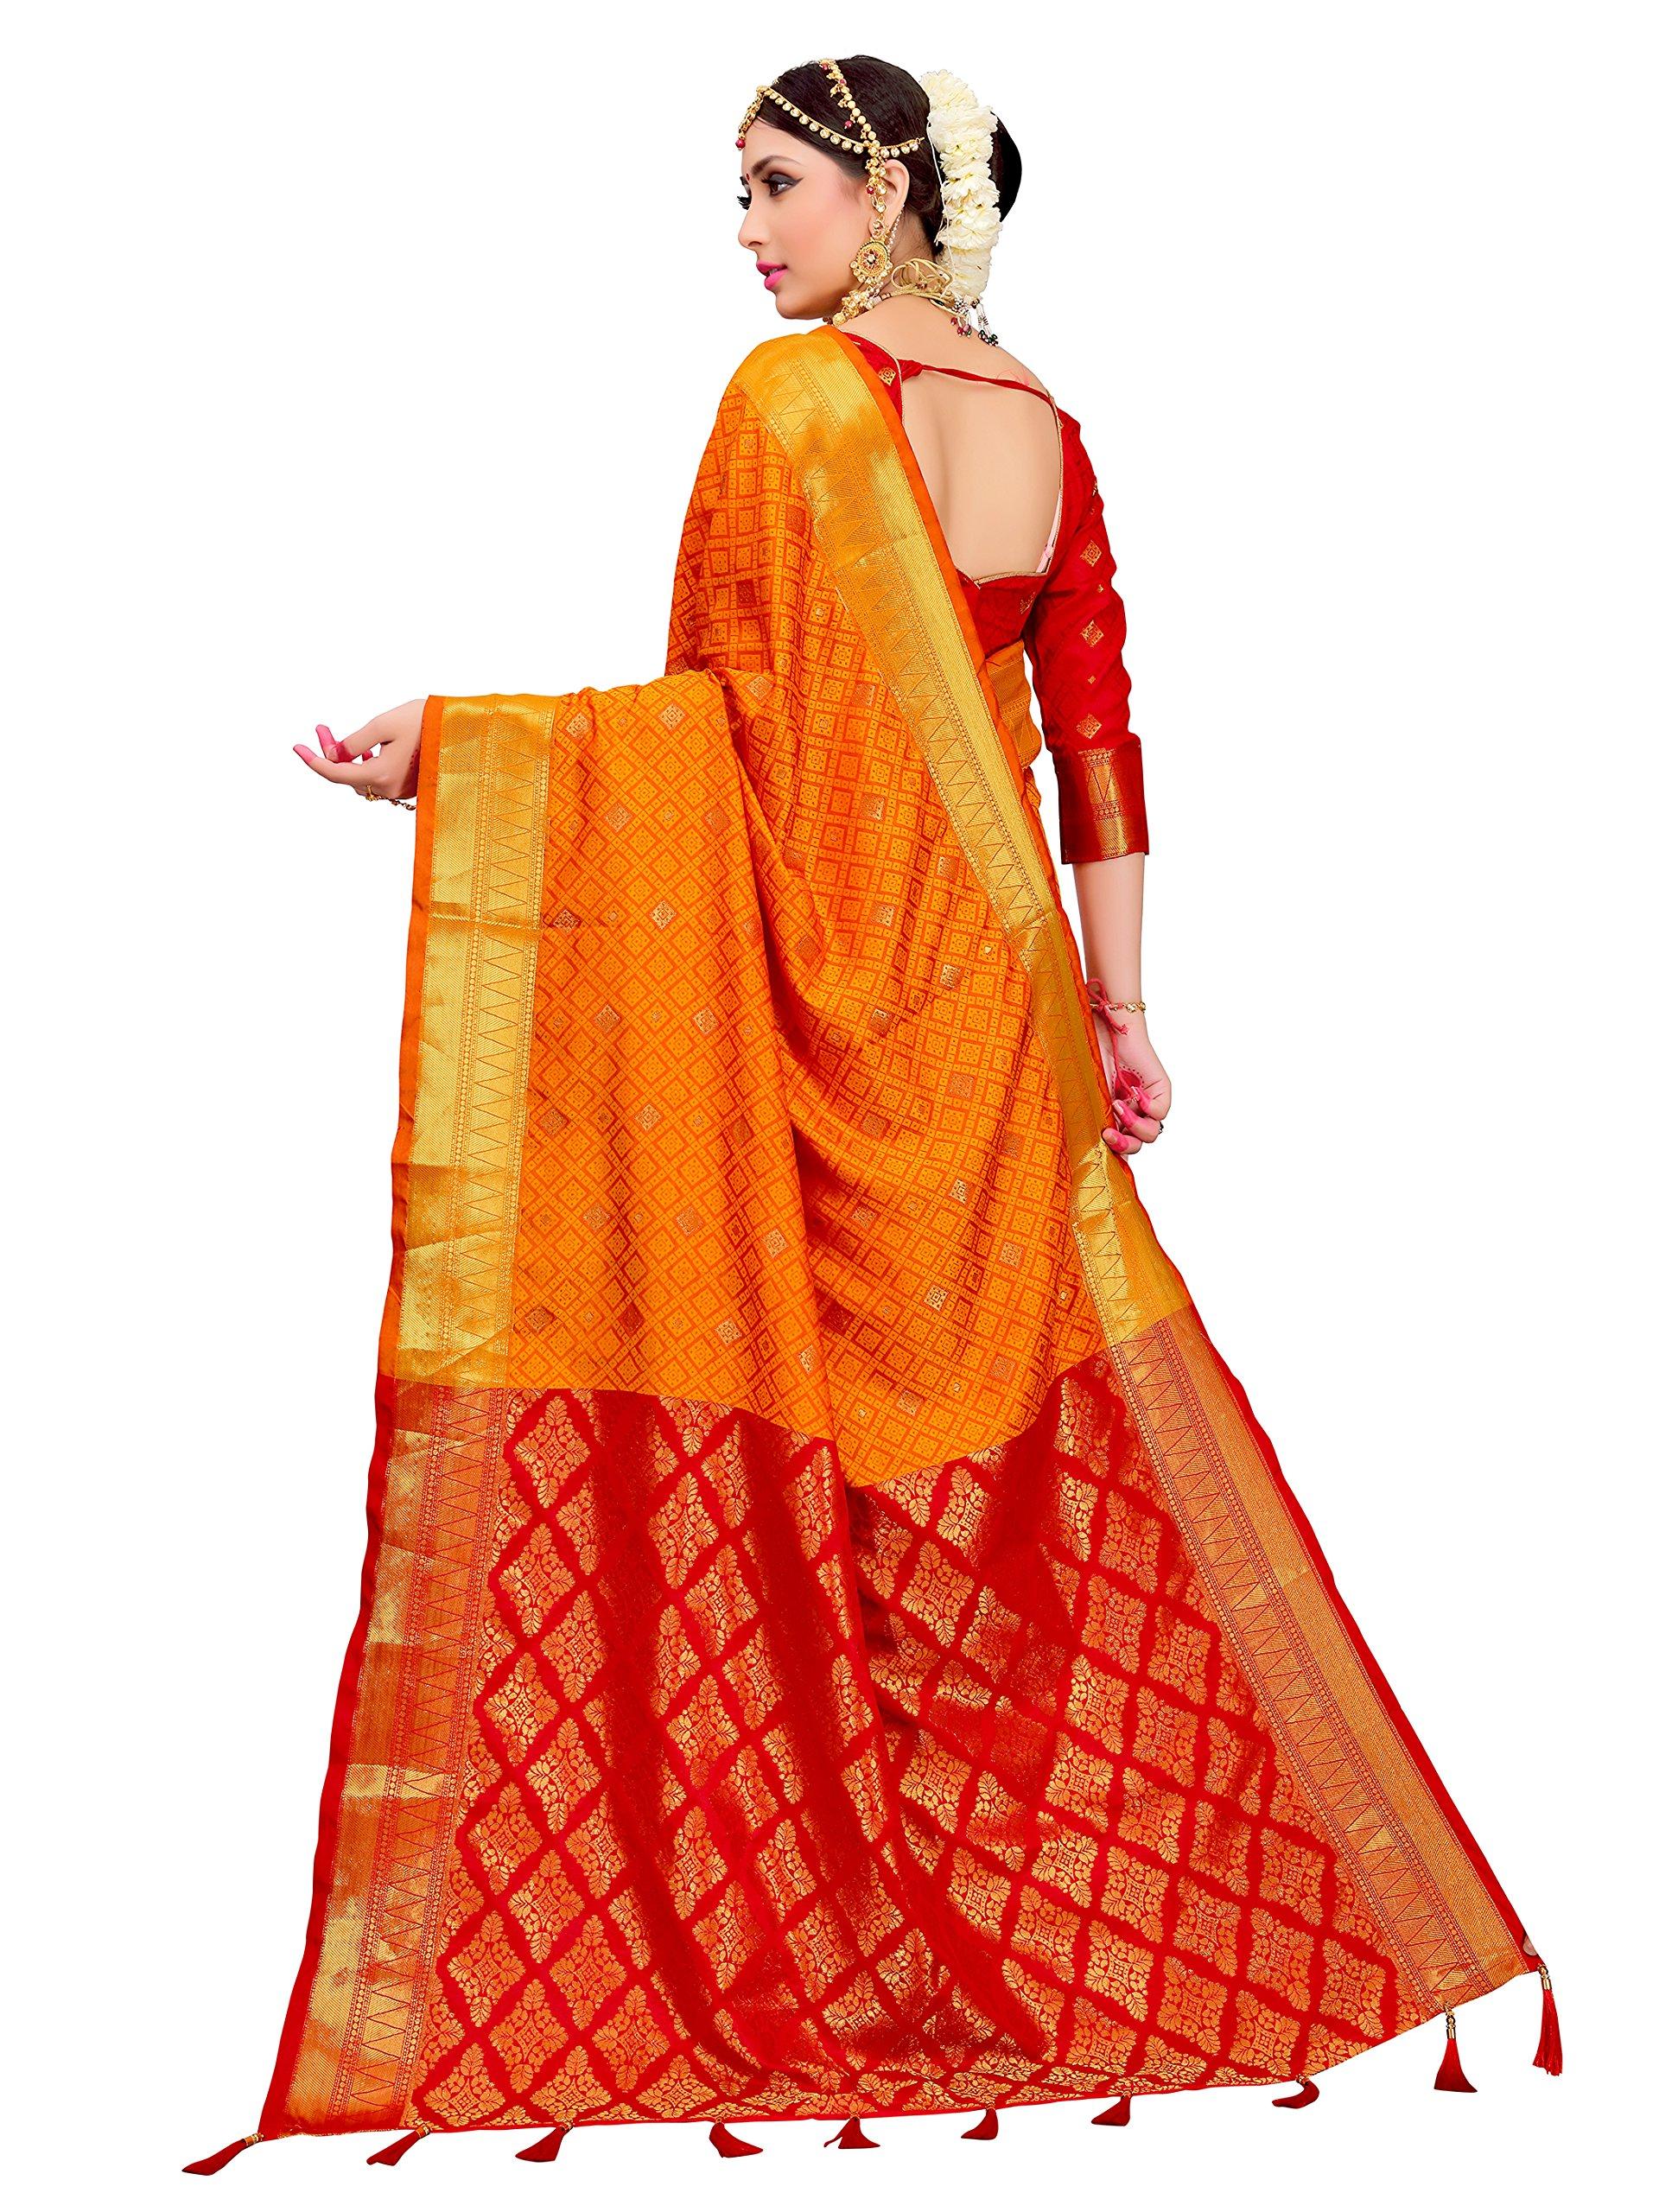 ELINA FASHION Sarees for Women Patola Art Silk Woven Work Saree l Indian Traditional Wedding Ethnic Sari with Blouse Piece (Yellow) by ELINA FASHION (Image #4)